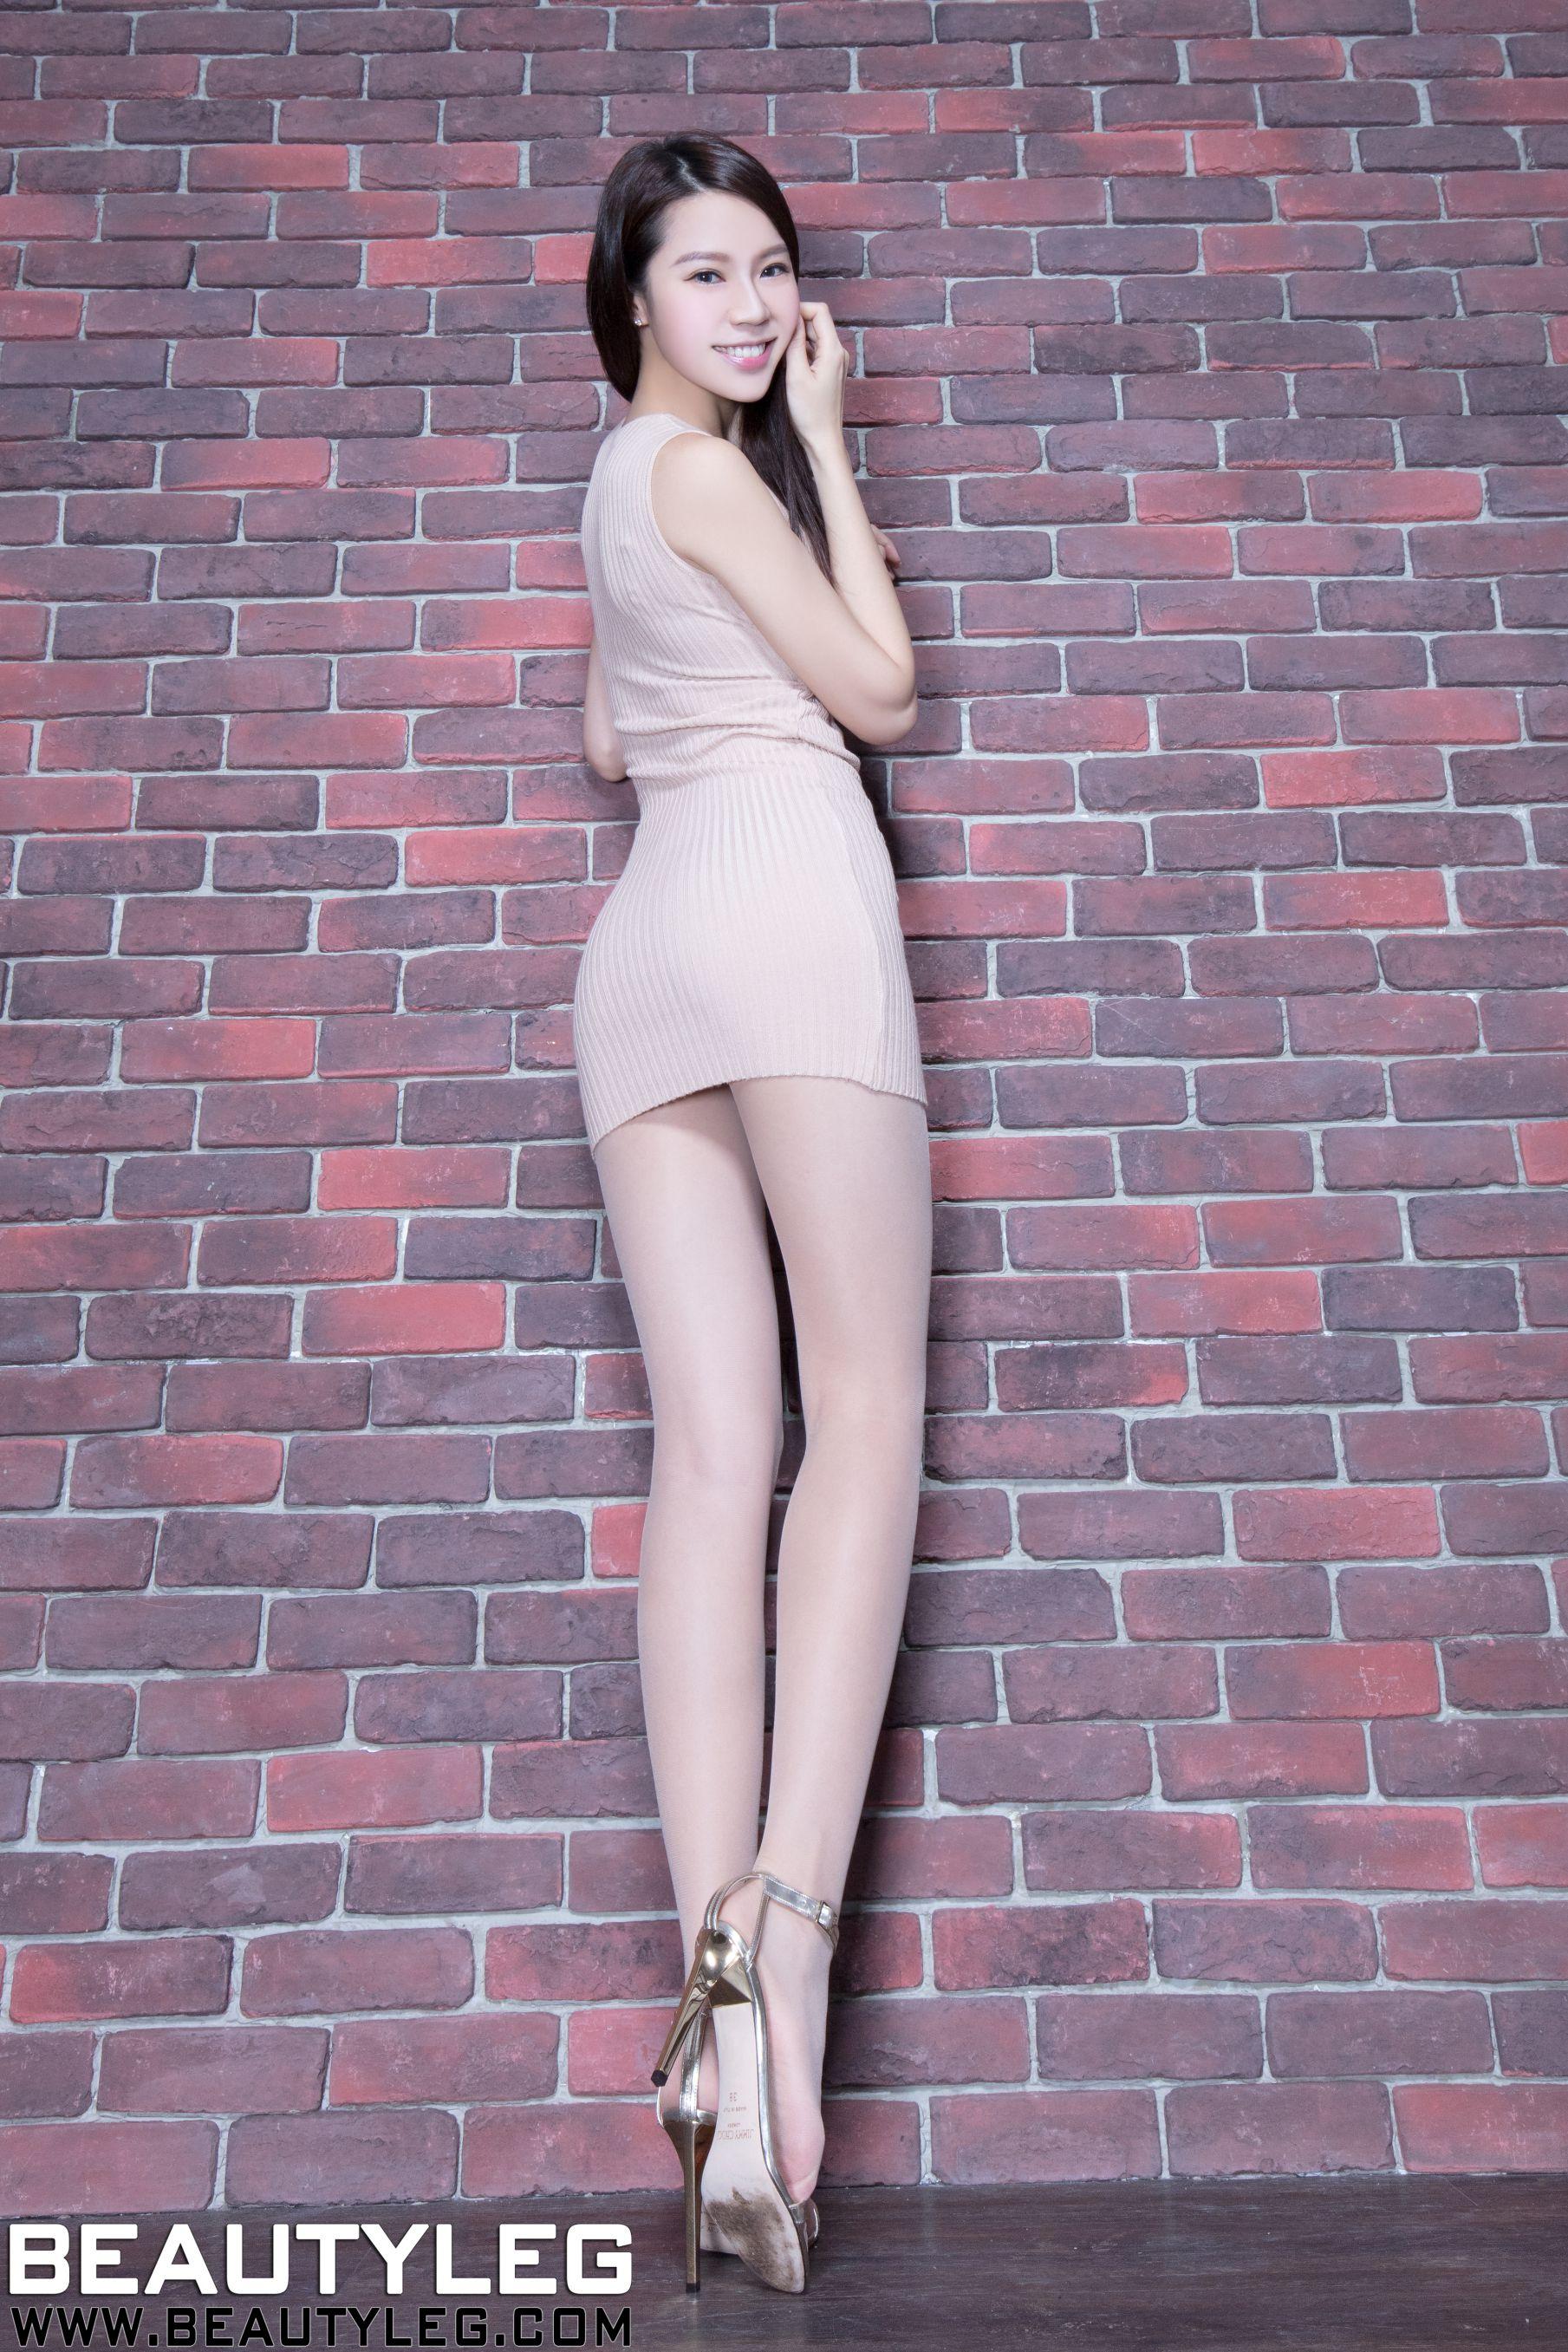 VOL.1232 [Beautyleg]丝袜美腿高跟美腿:腿模Christine高品质写真套图(51P)